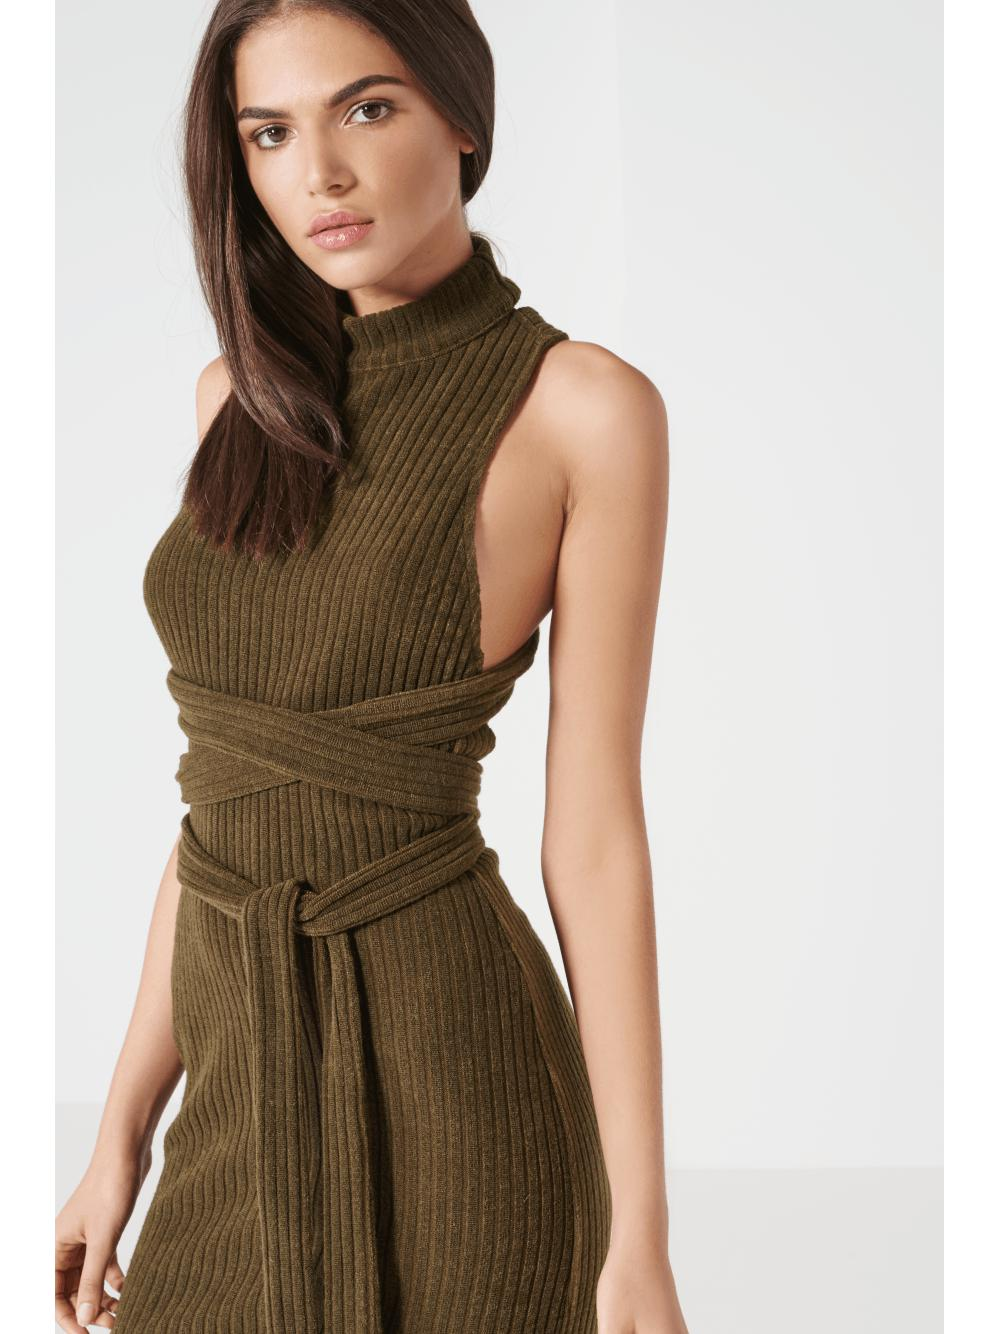 a68b0383e7b4 Lyst - Lavish Alice Khaki Rib Knit Open Back Wrap Tie Midi Dress